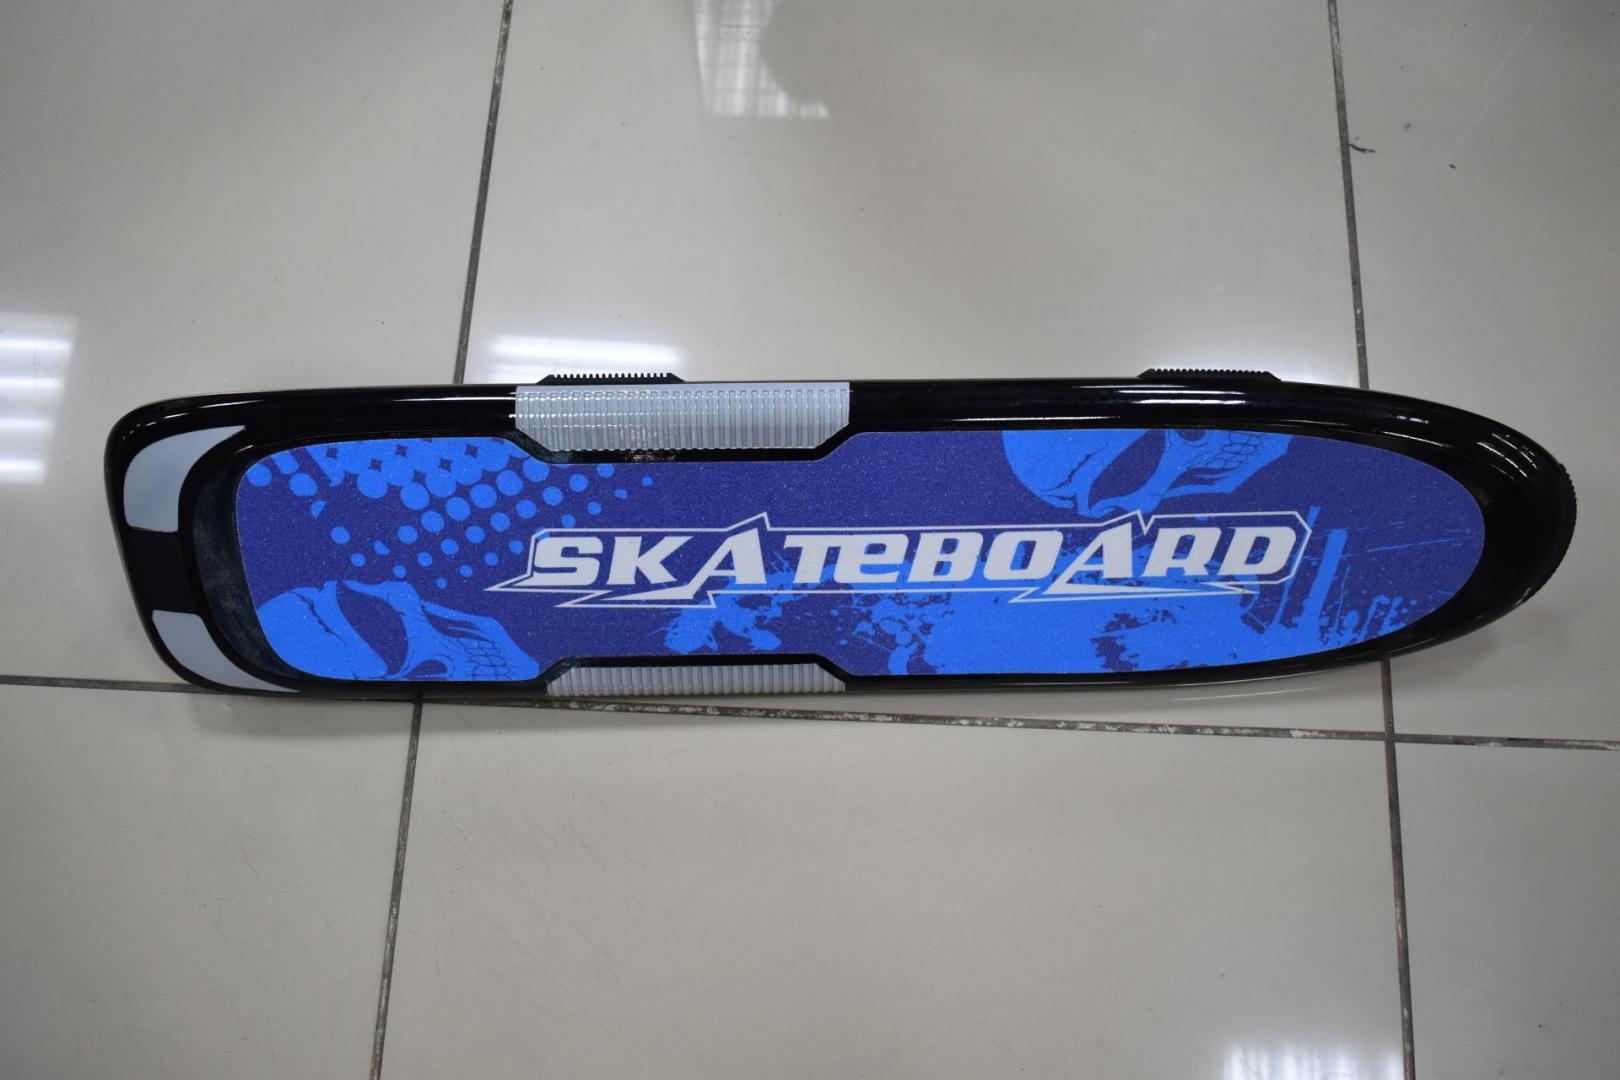 Двухколесный электрический скейт (роллерсерф) Ел-Спорт скатебоард 300W 8,8аh фото